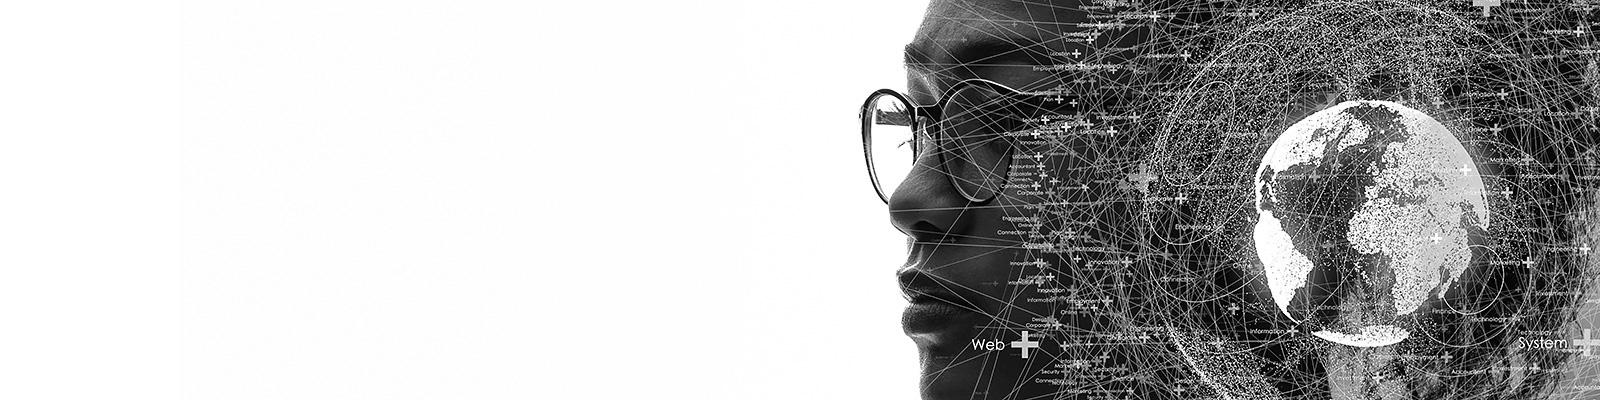 AI 人間 テクノロジー イメージ